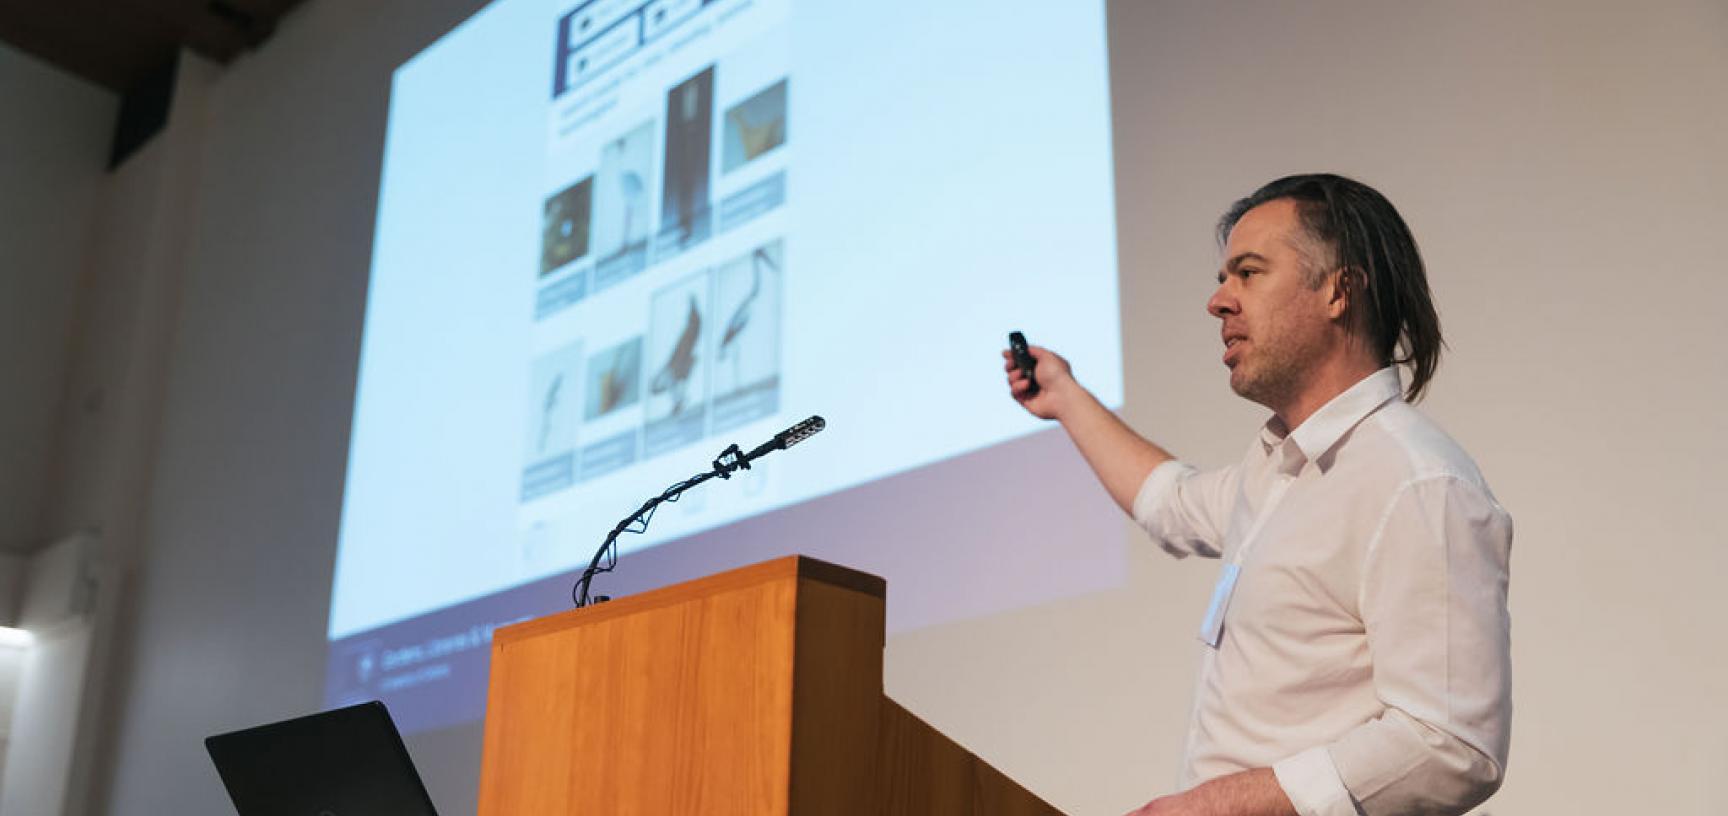 GLAM digital showcase - machine-readable interface talk